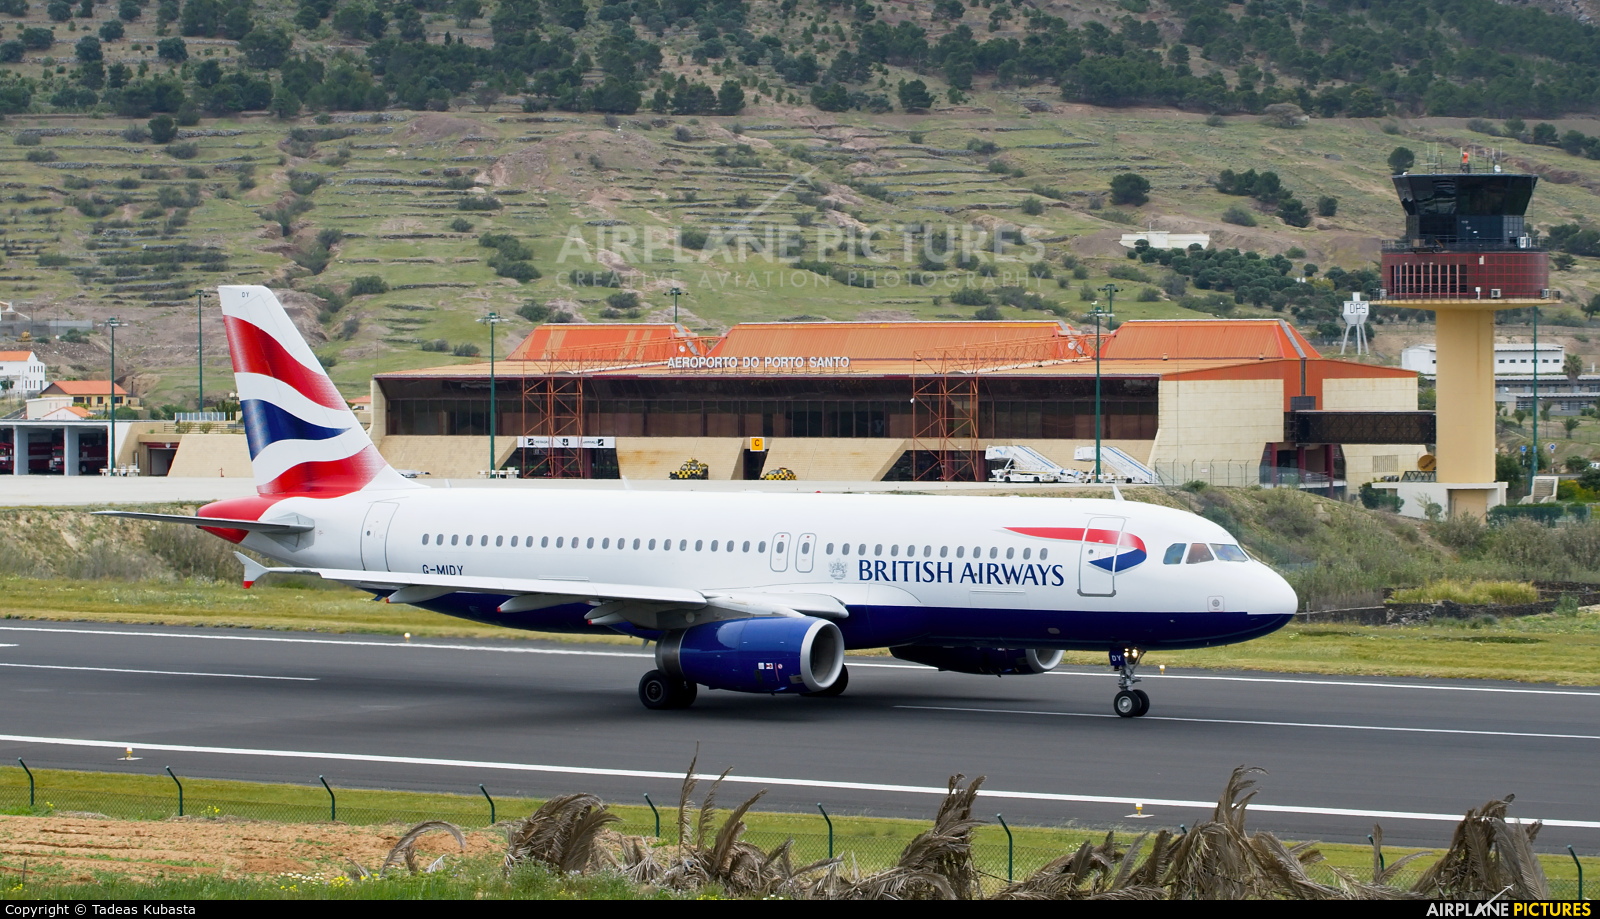 British Airways G-MIDY aircraft at Porto Santo